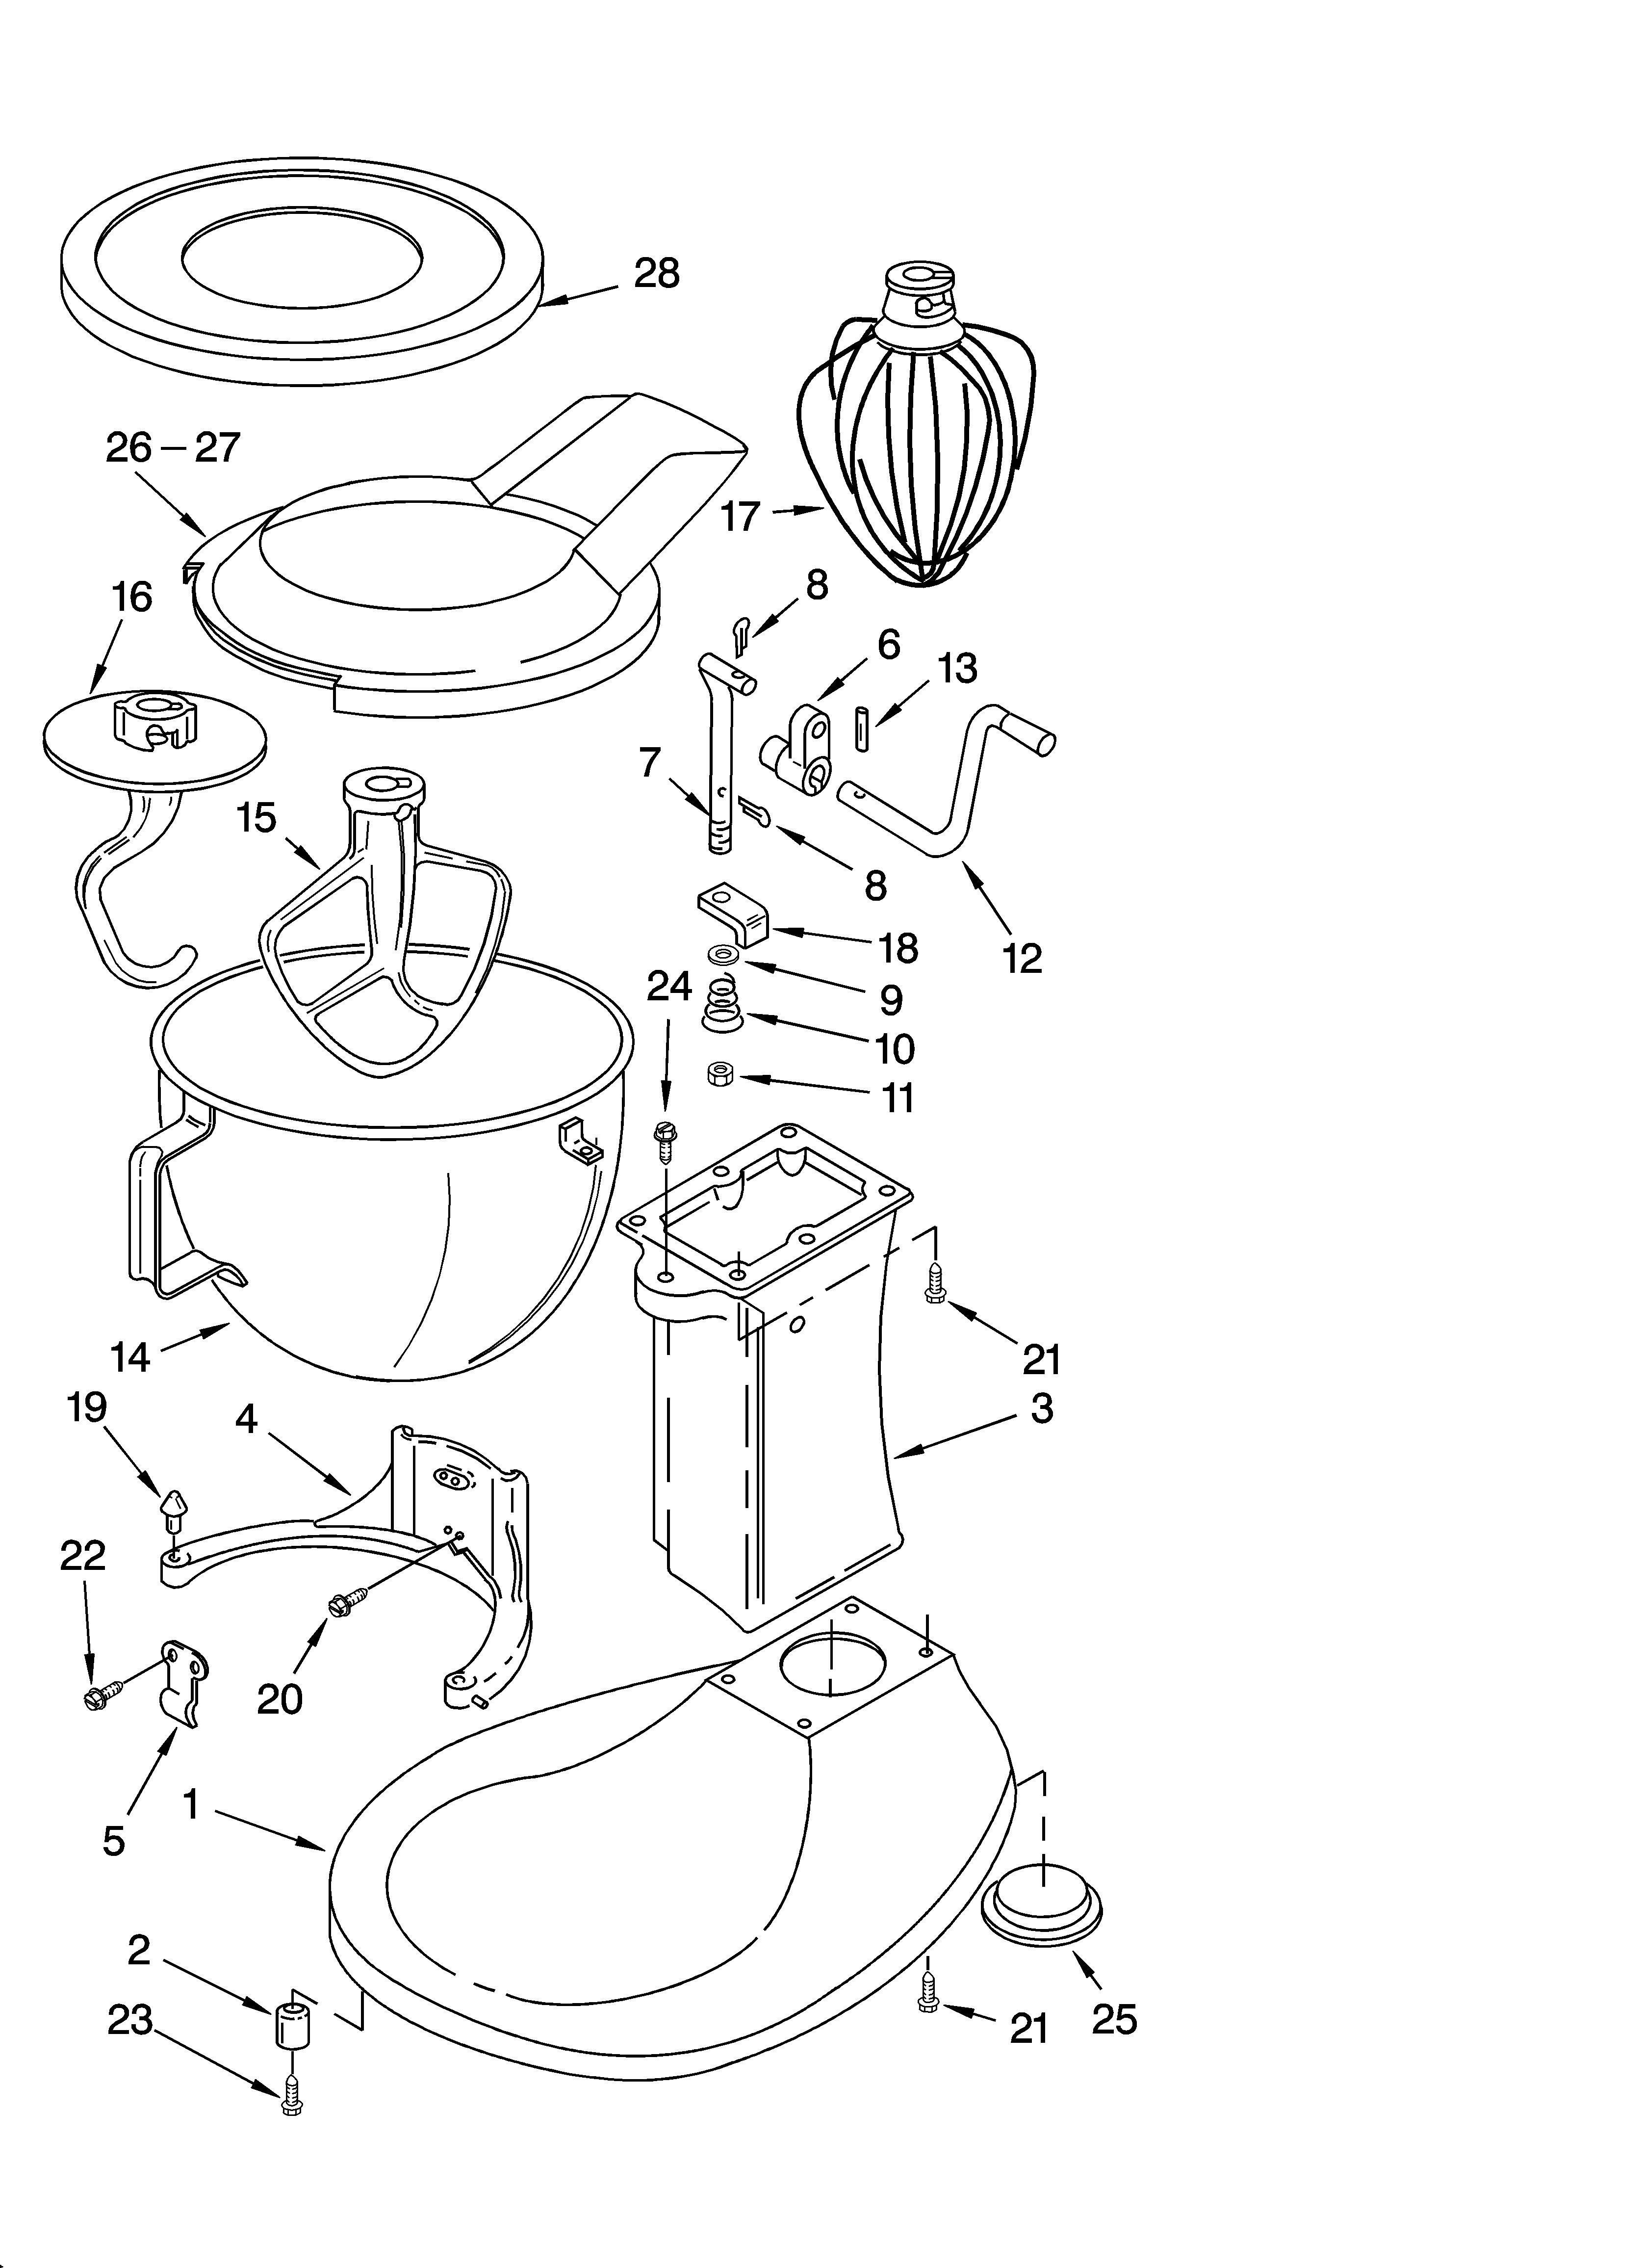 medium resolution of base and pedestal unit diagram parts list for model k5ss kitchenaid parts mixer